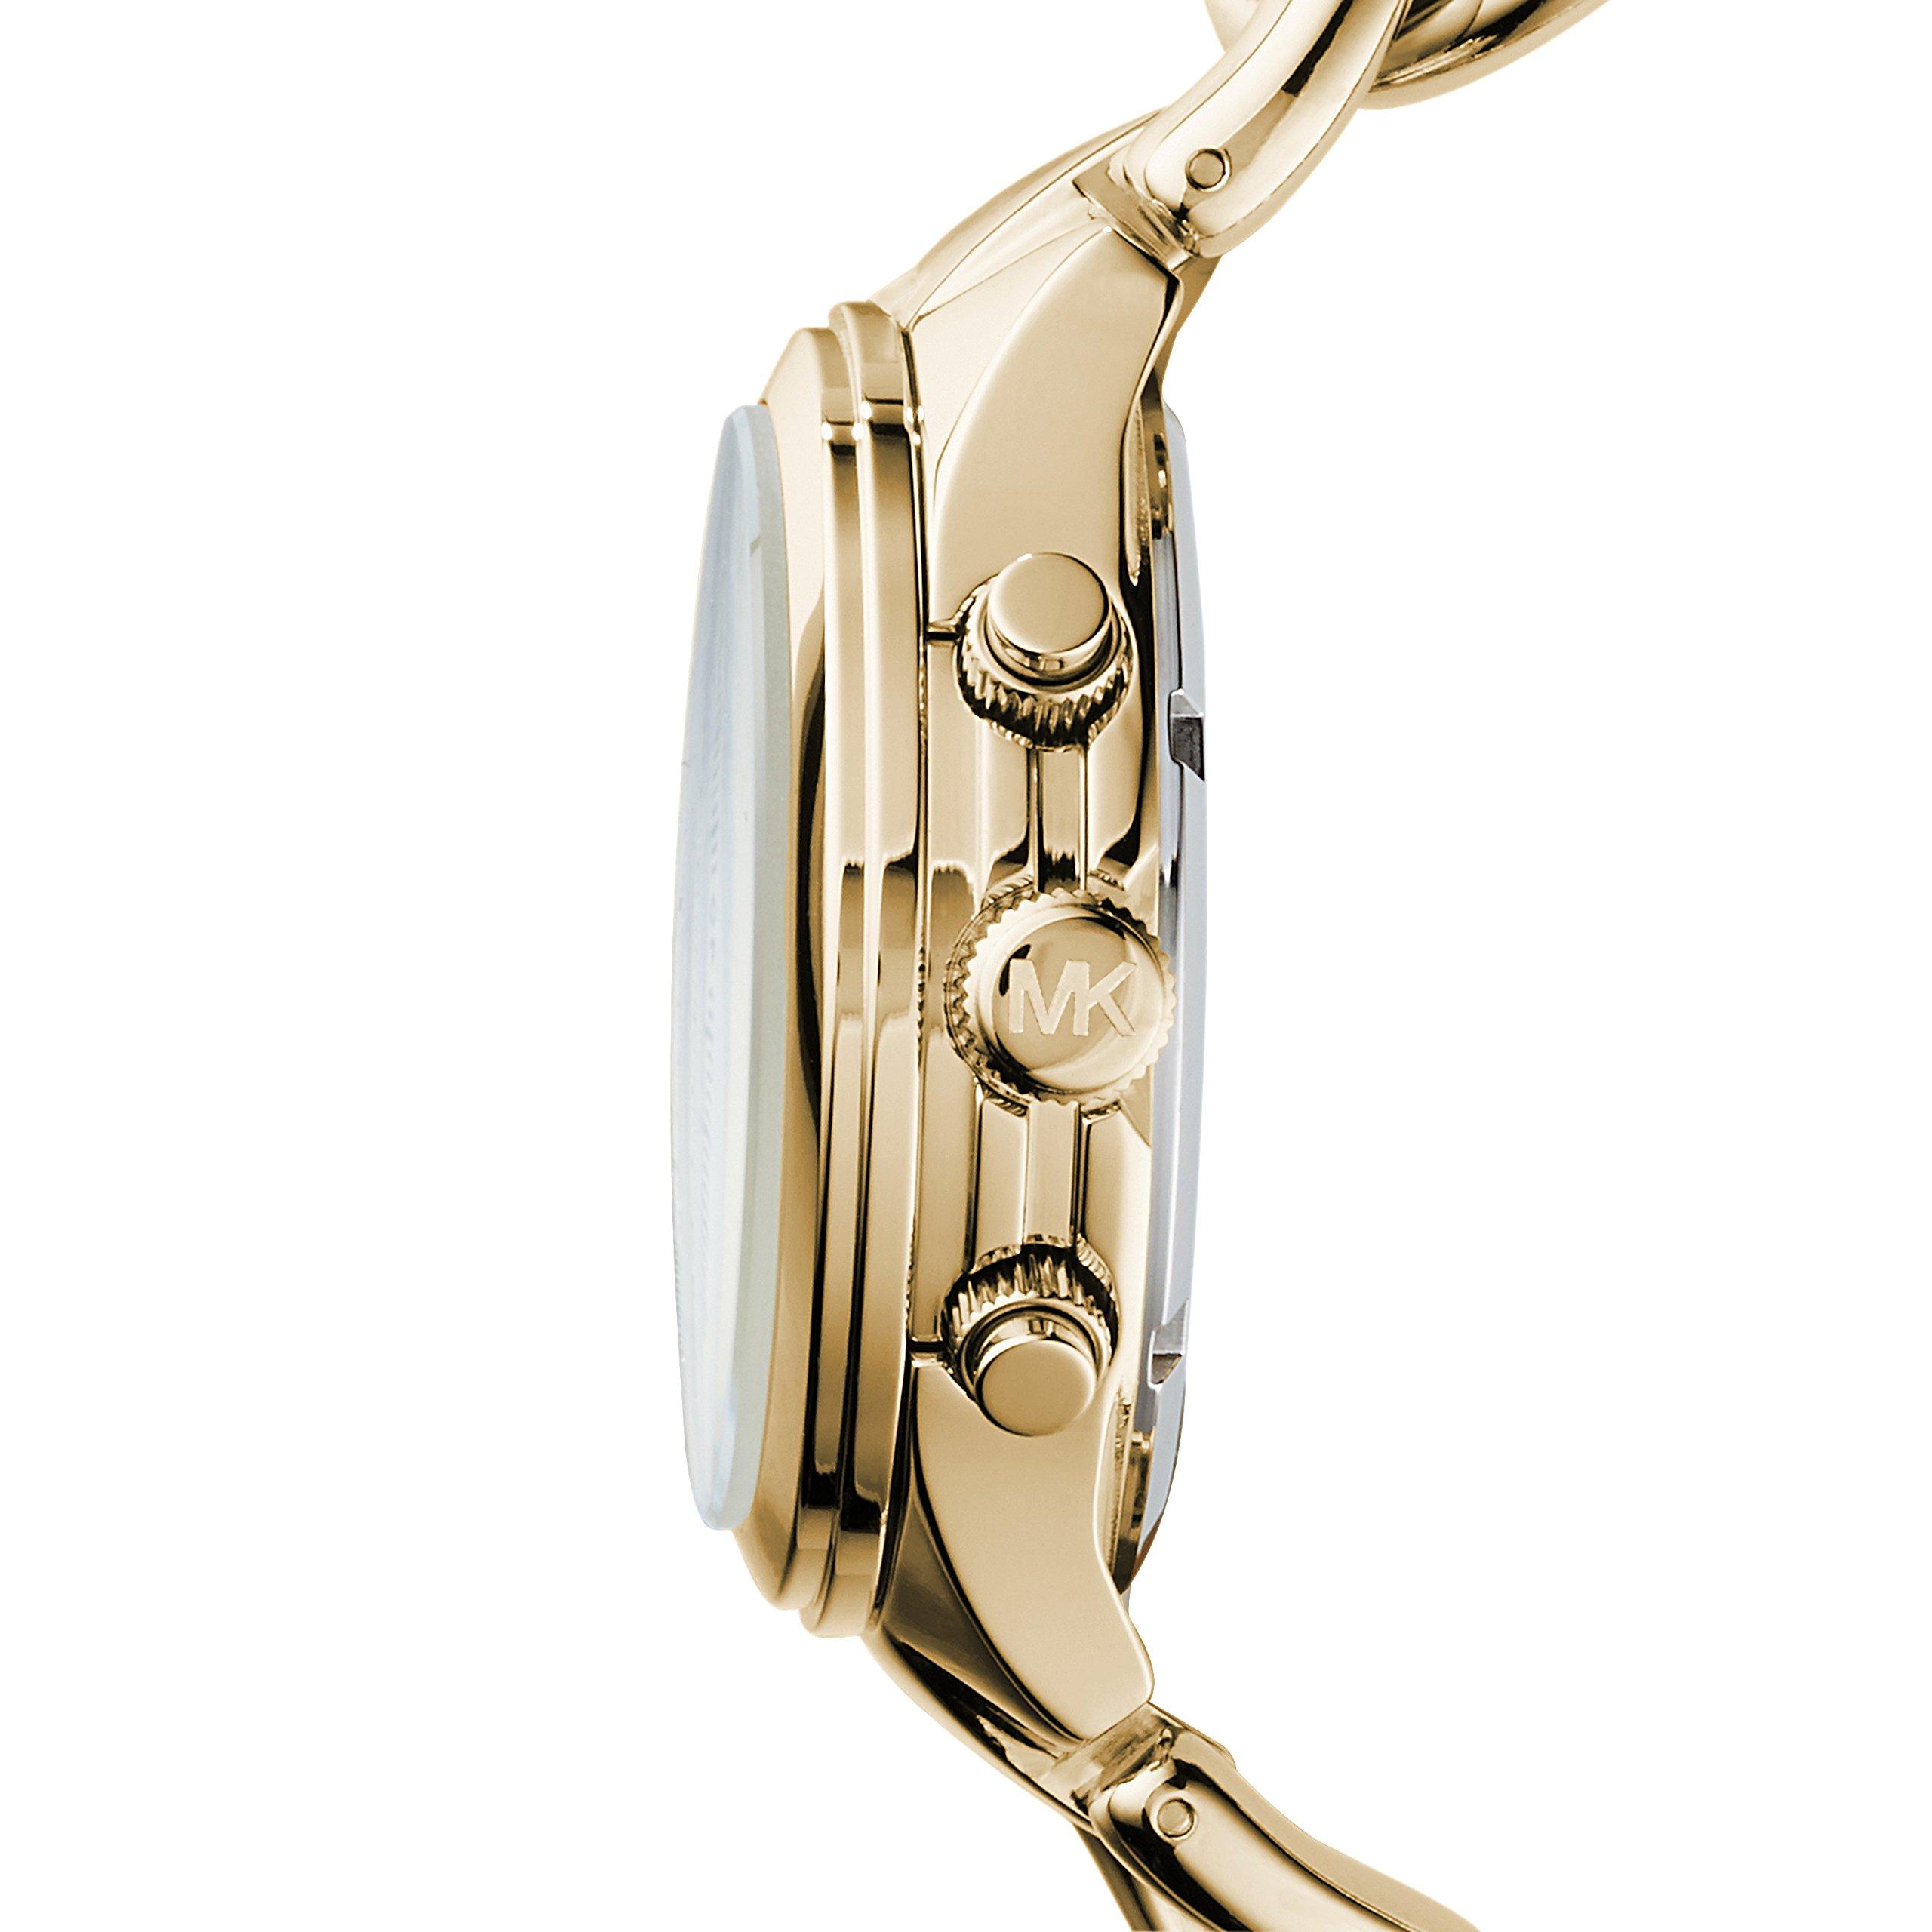 Michael Kors Women's Runway Gold-Tone Watch MK3131 by Michael Kors (Image #2)